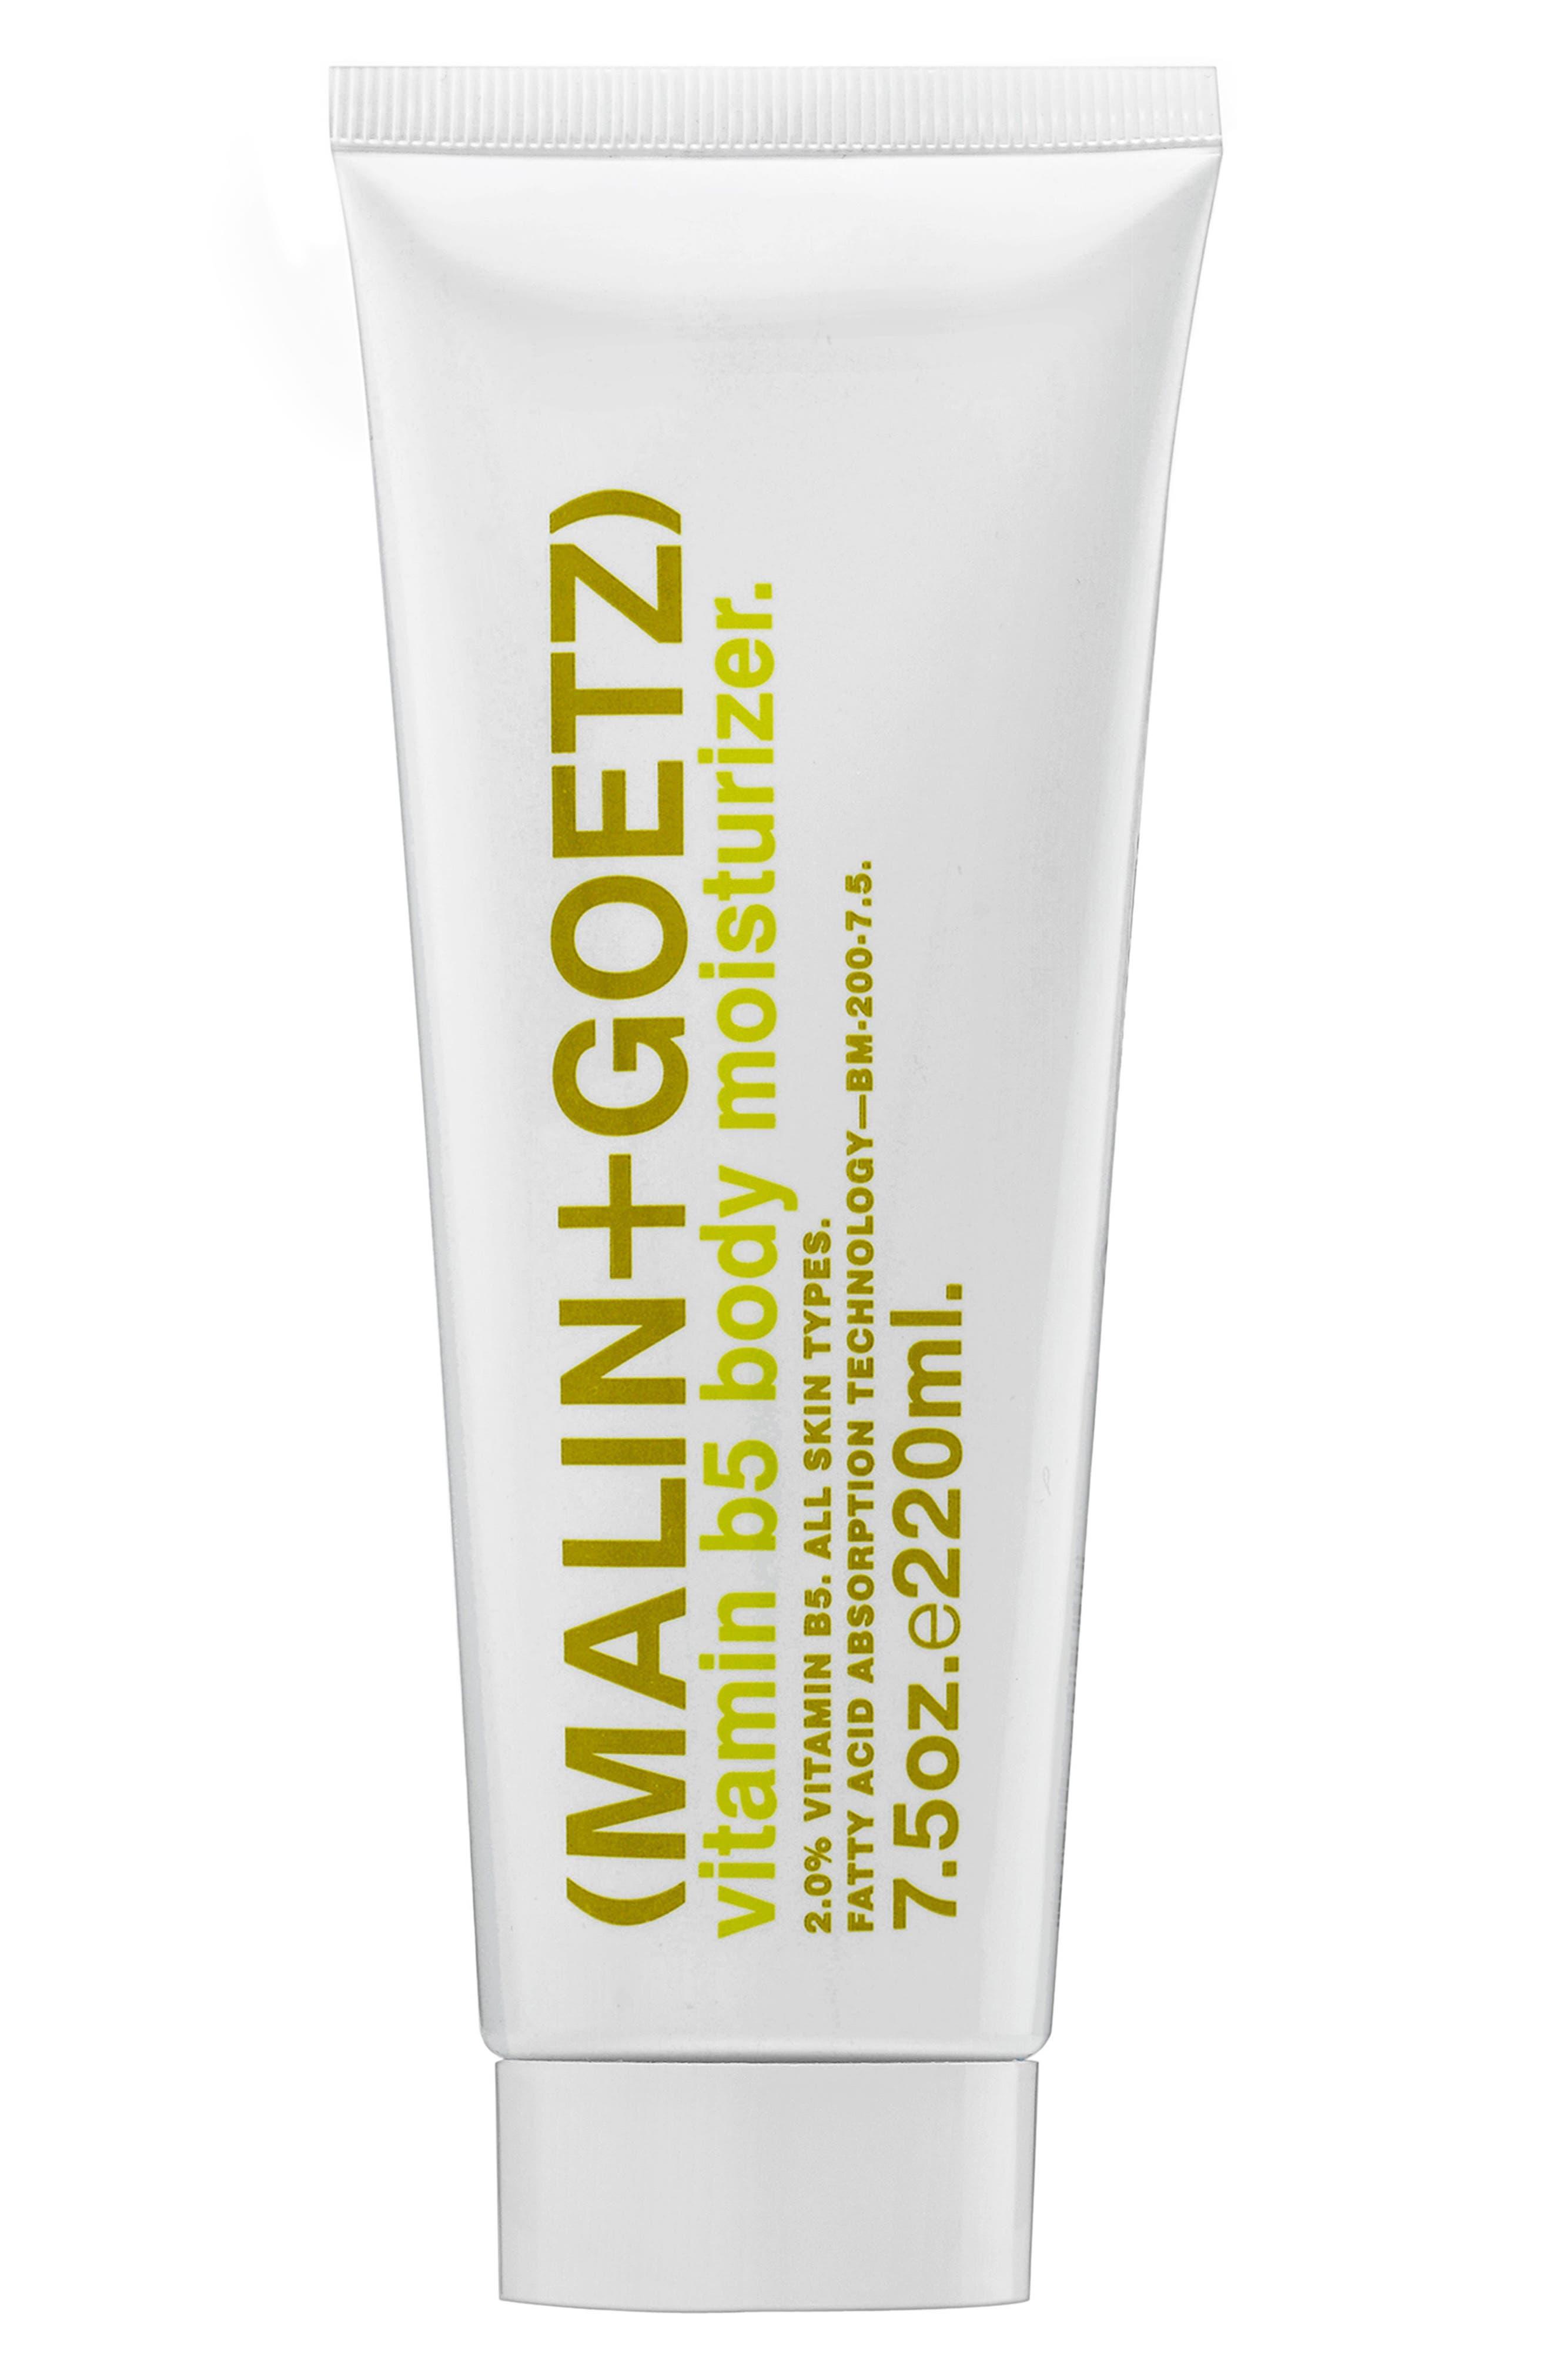 Alternate Image 1 Selected - Malin + Goetz Vitamin B5 Body Moisturizer